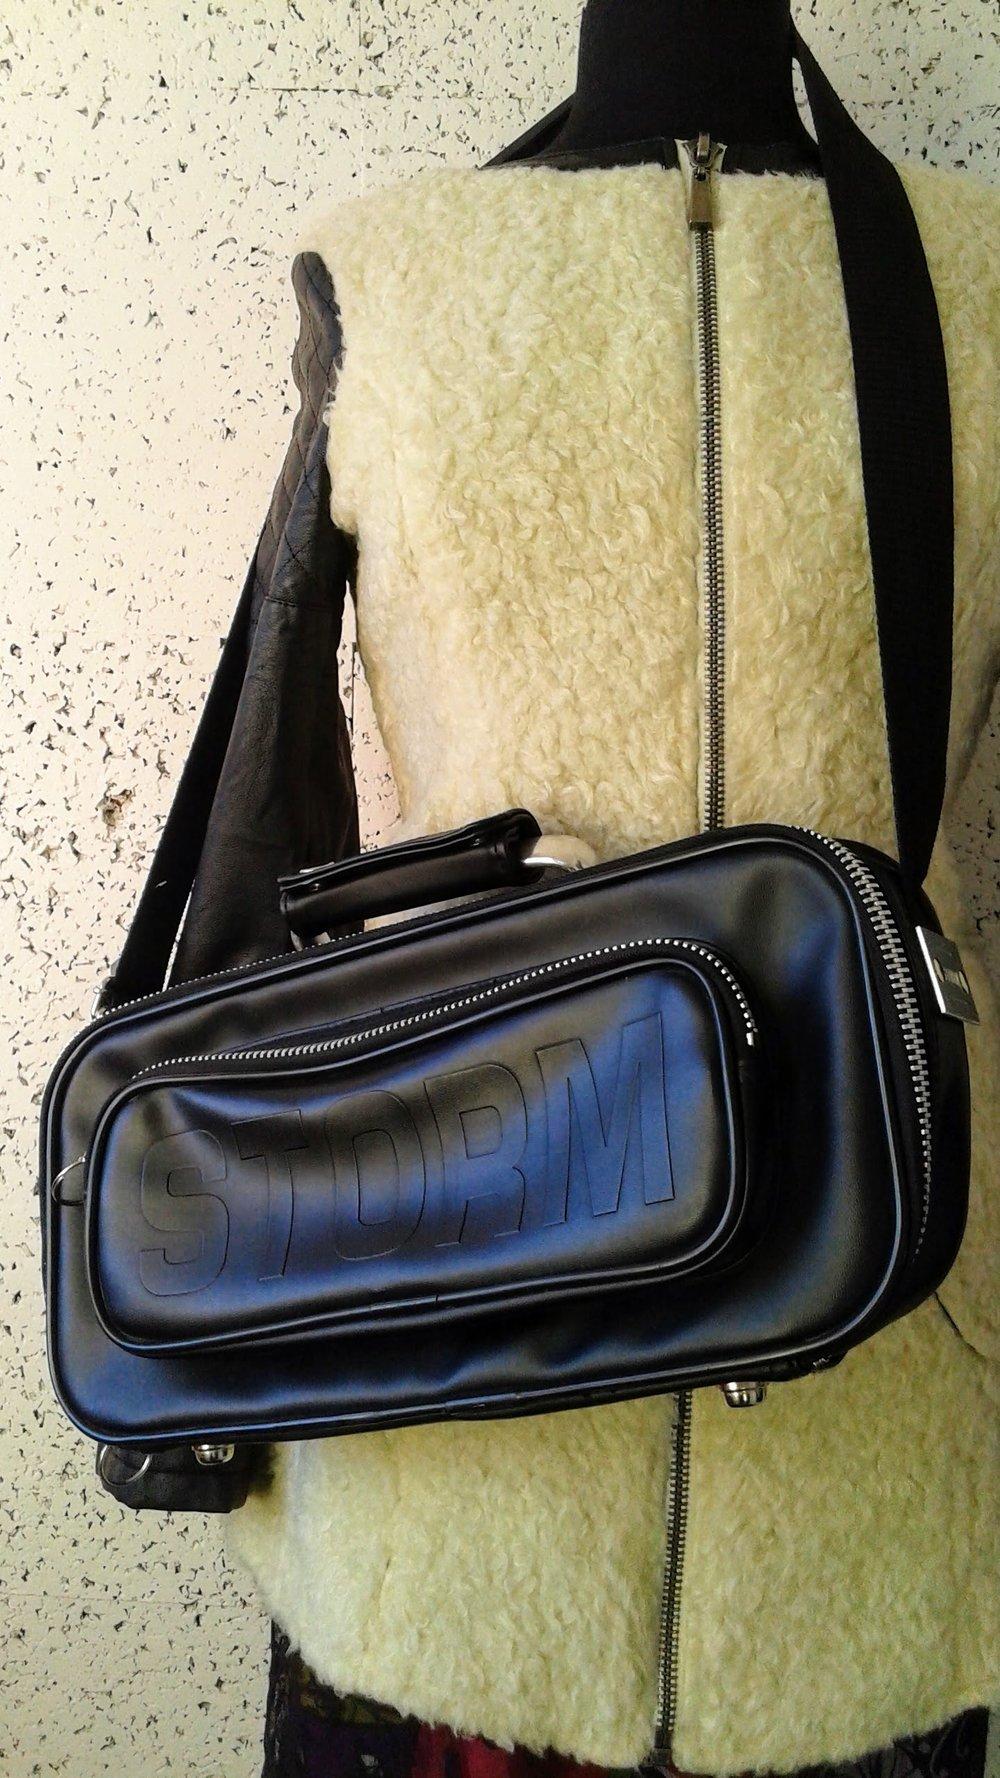 Storm London bag; $30